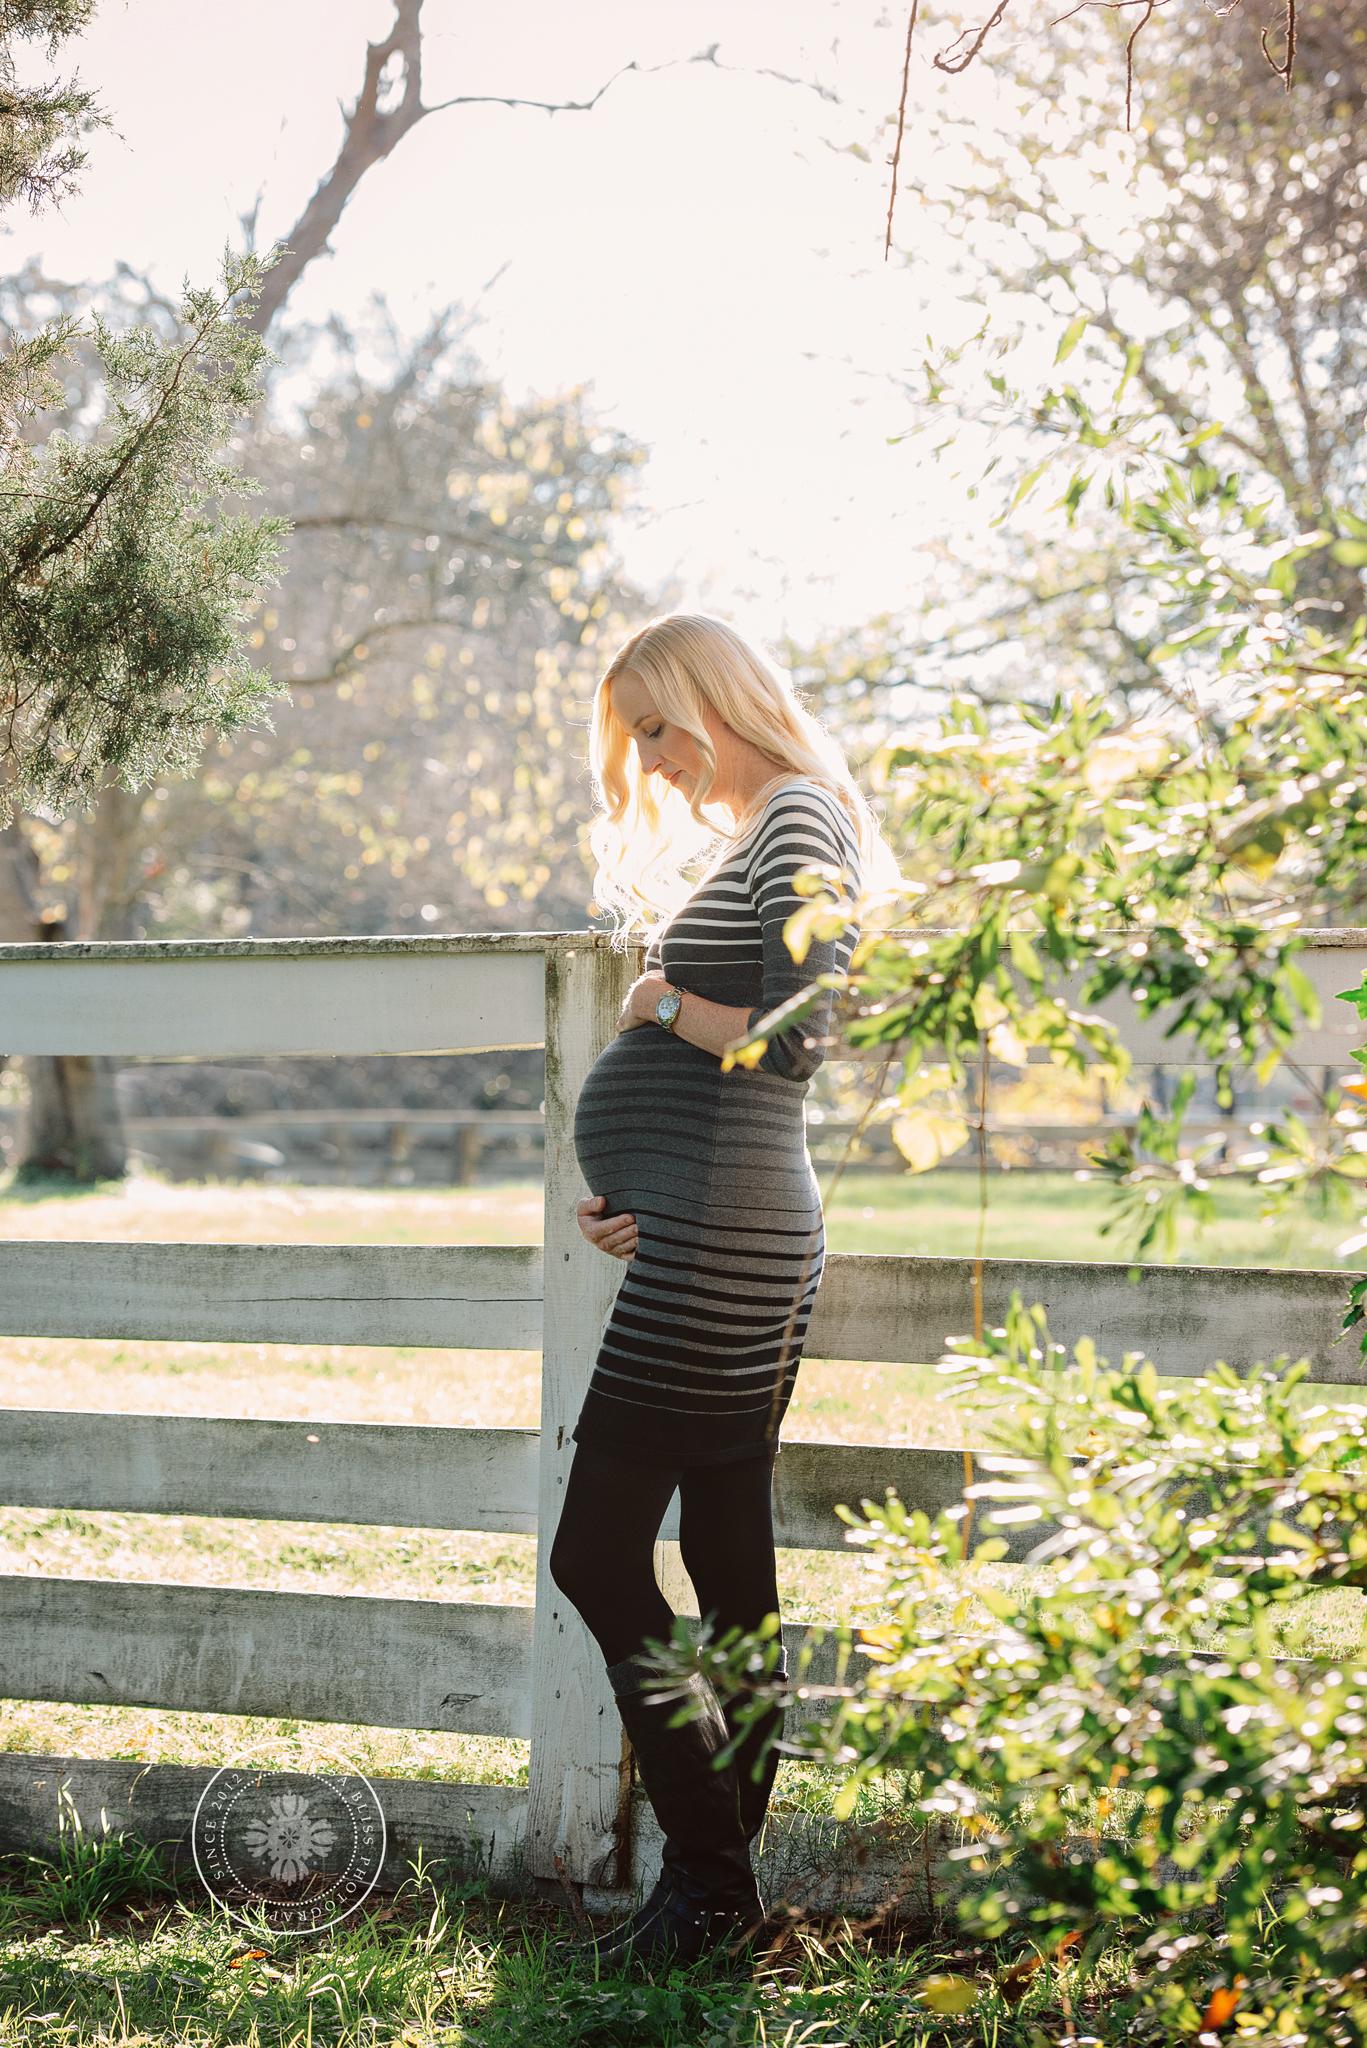 virginia-beach-maternity-portraits-melissa-bliss-photography-norfolk-chesapeake-williamsburg-maternity-photographers